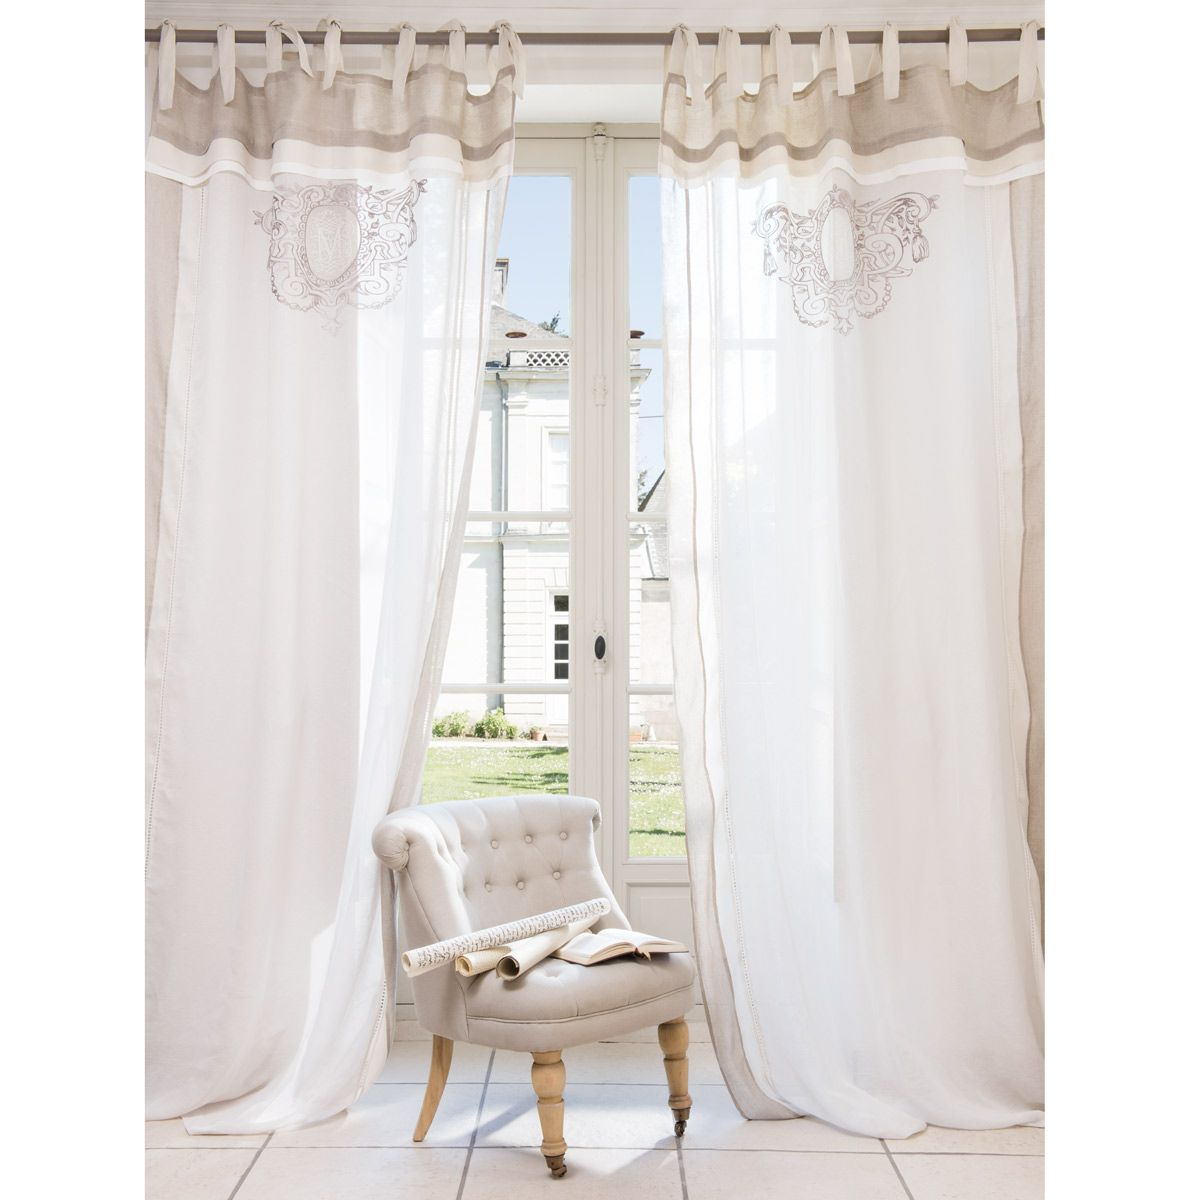 Maison Du Monde Tende.Tessile Drapes Curtain Drapes Curtains Curtains Decor